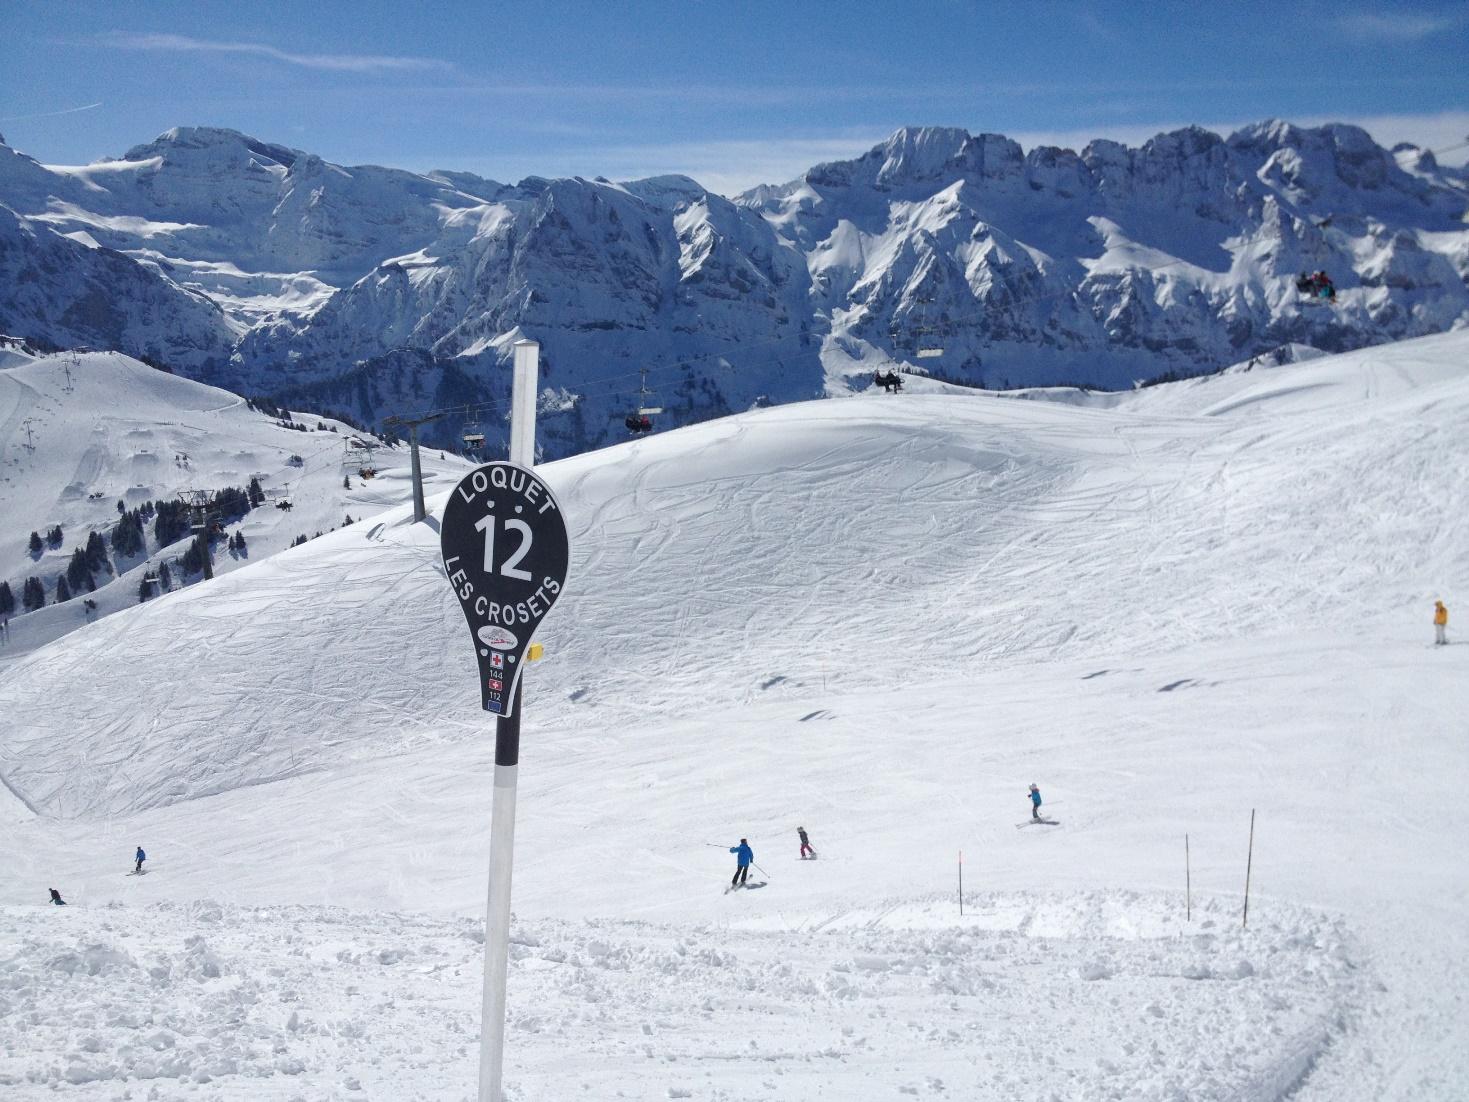 Les Crosets In The Portes Du Soleil Ski Area